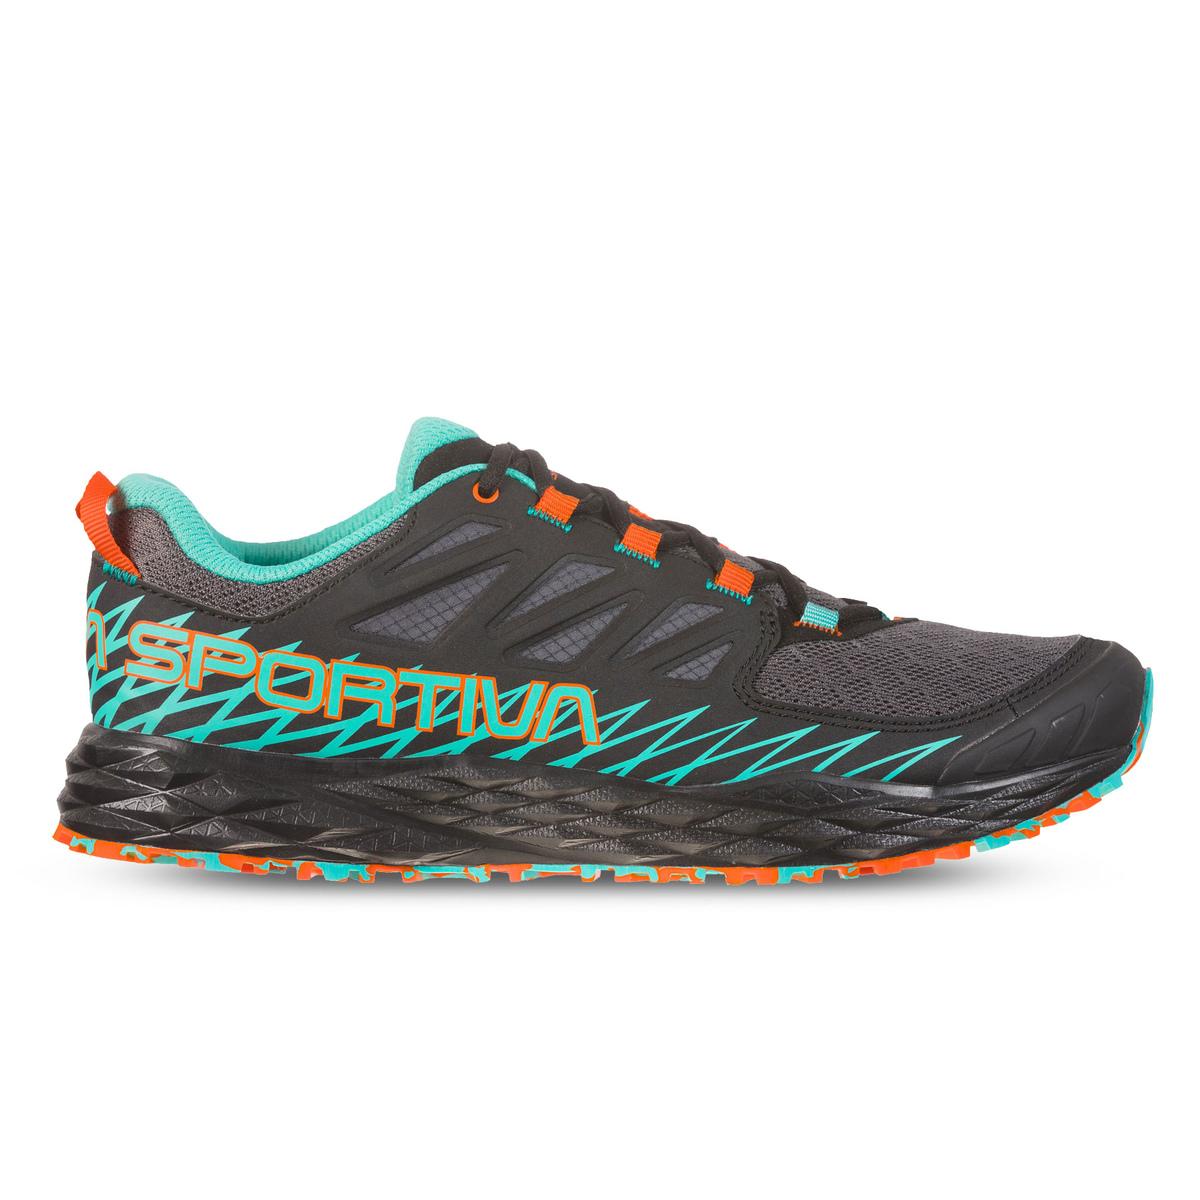 Outlet di scarpe da running Running Warehouse La Sportiva